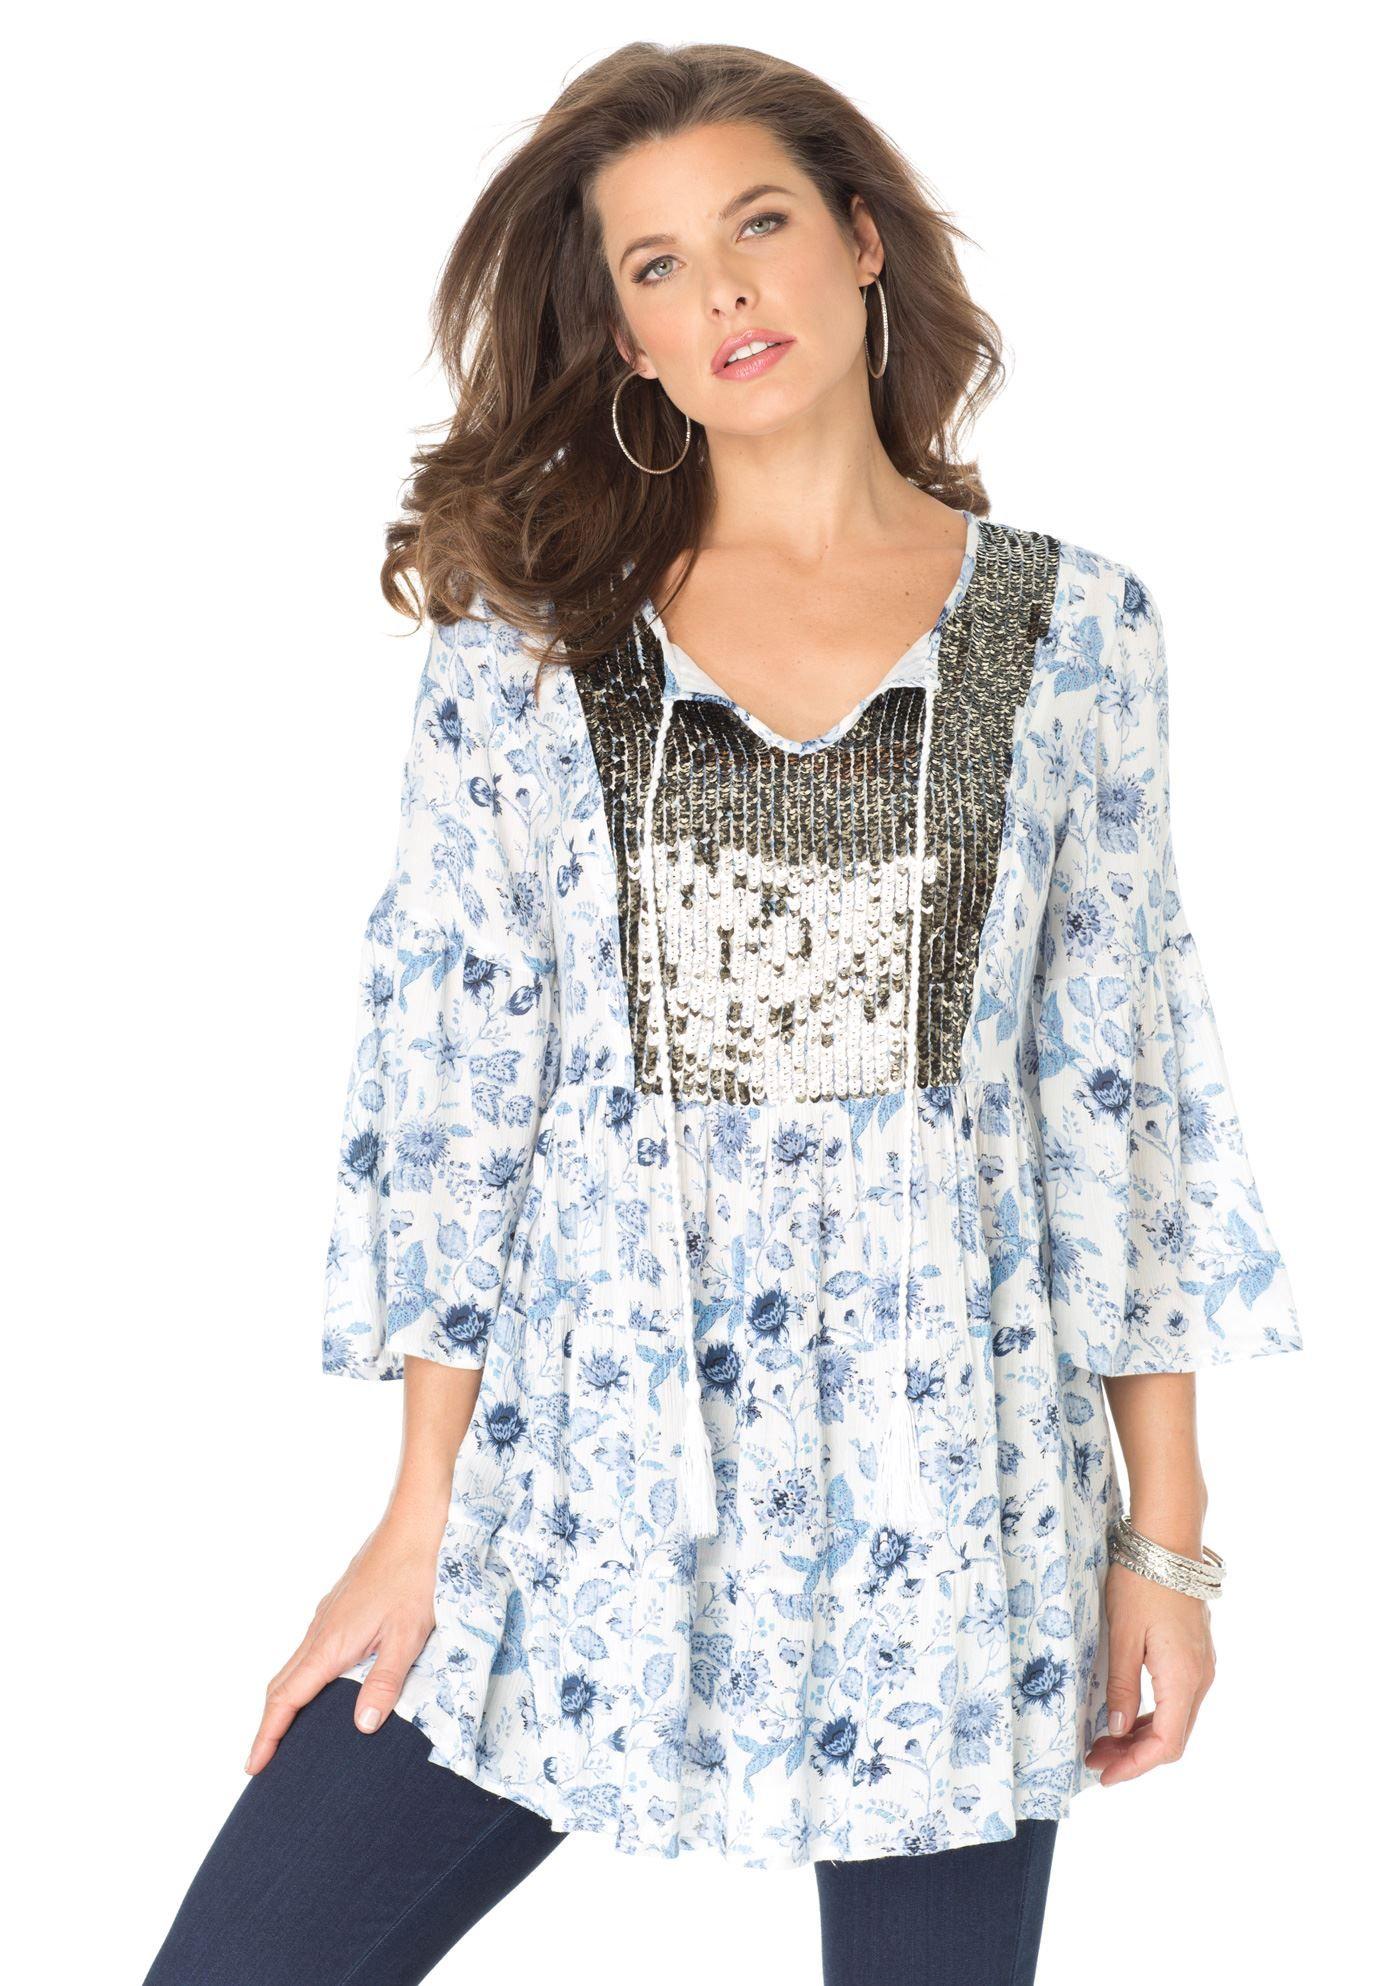 Sequin Embellished Tunic by Denim 24/7   Plus Size Tunics   Roamans